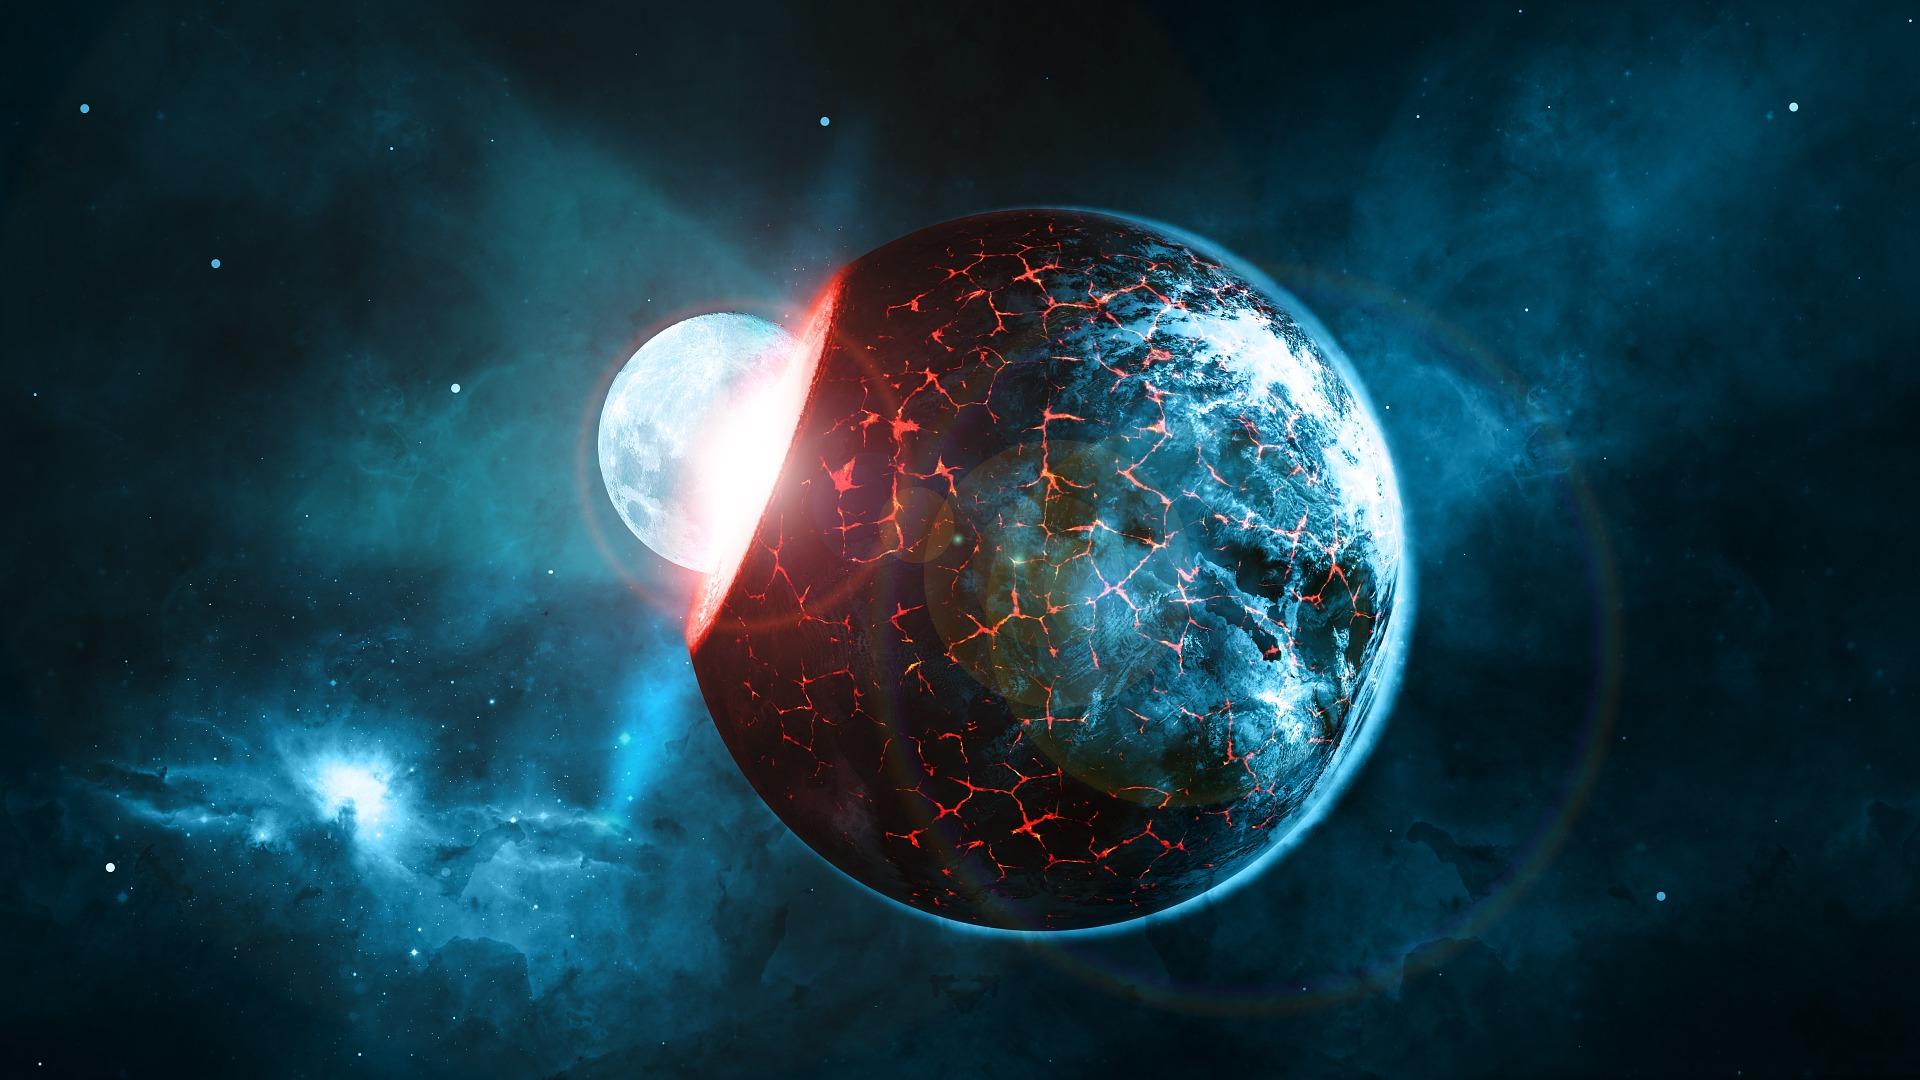 planet-846181_1920